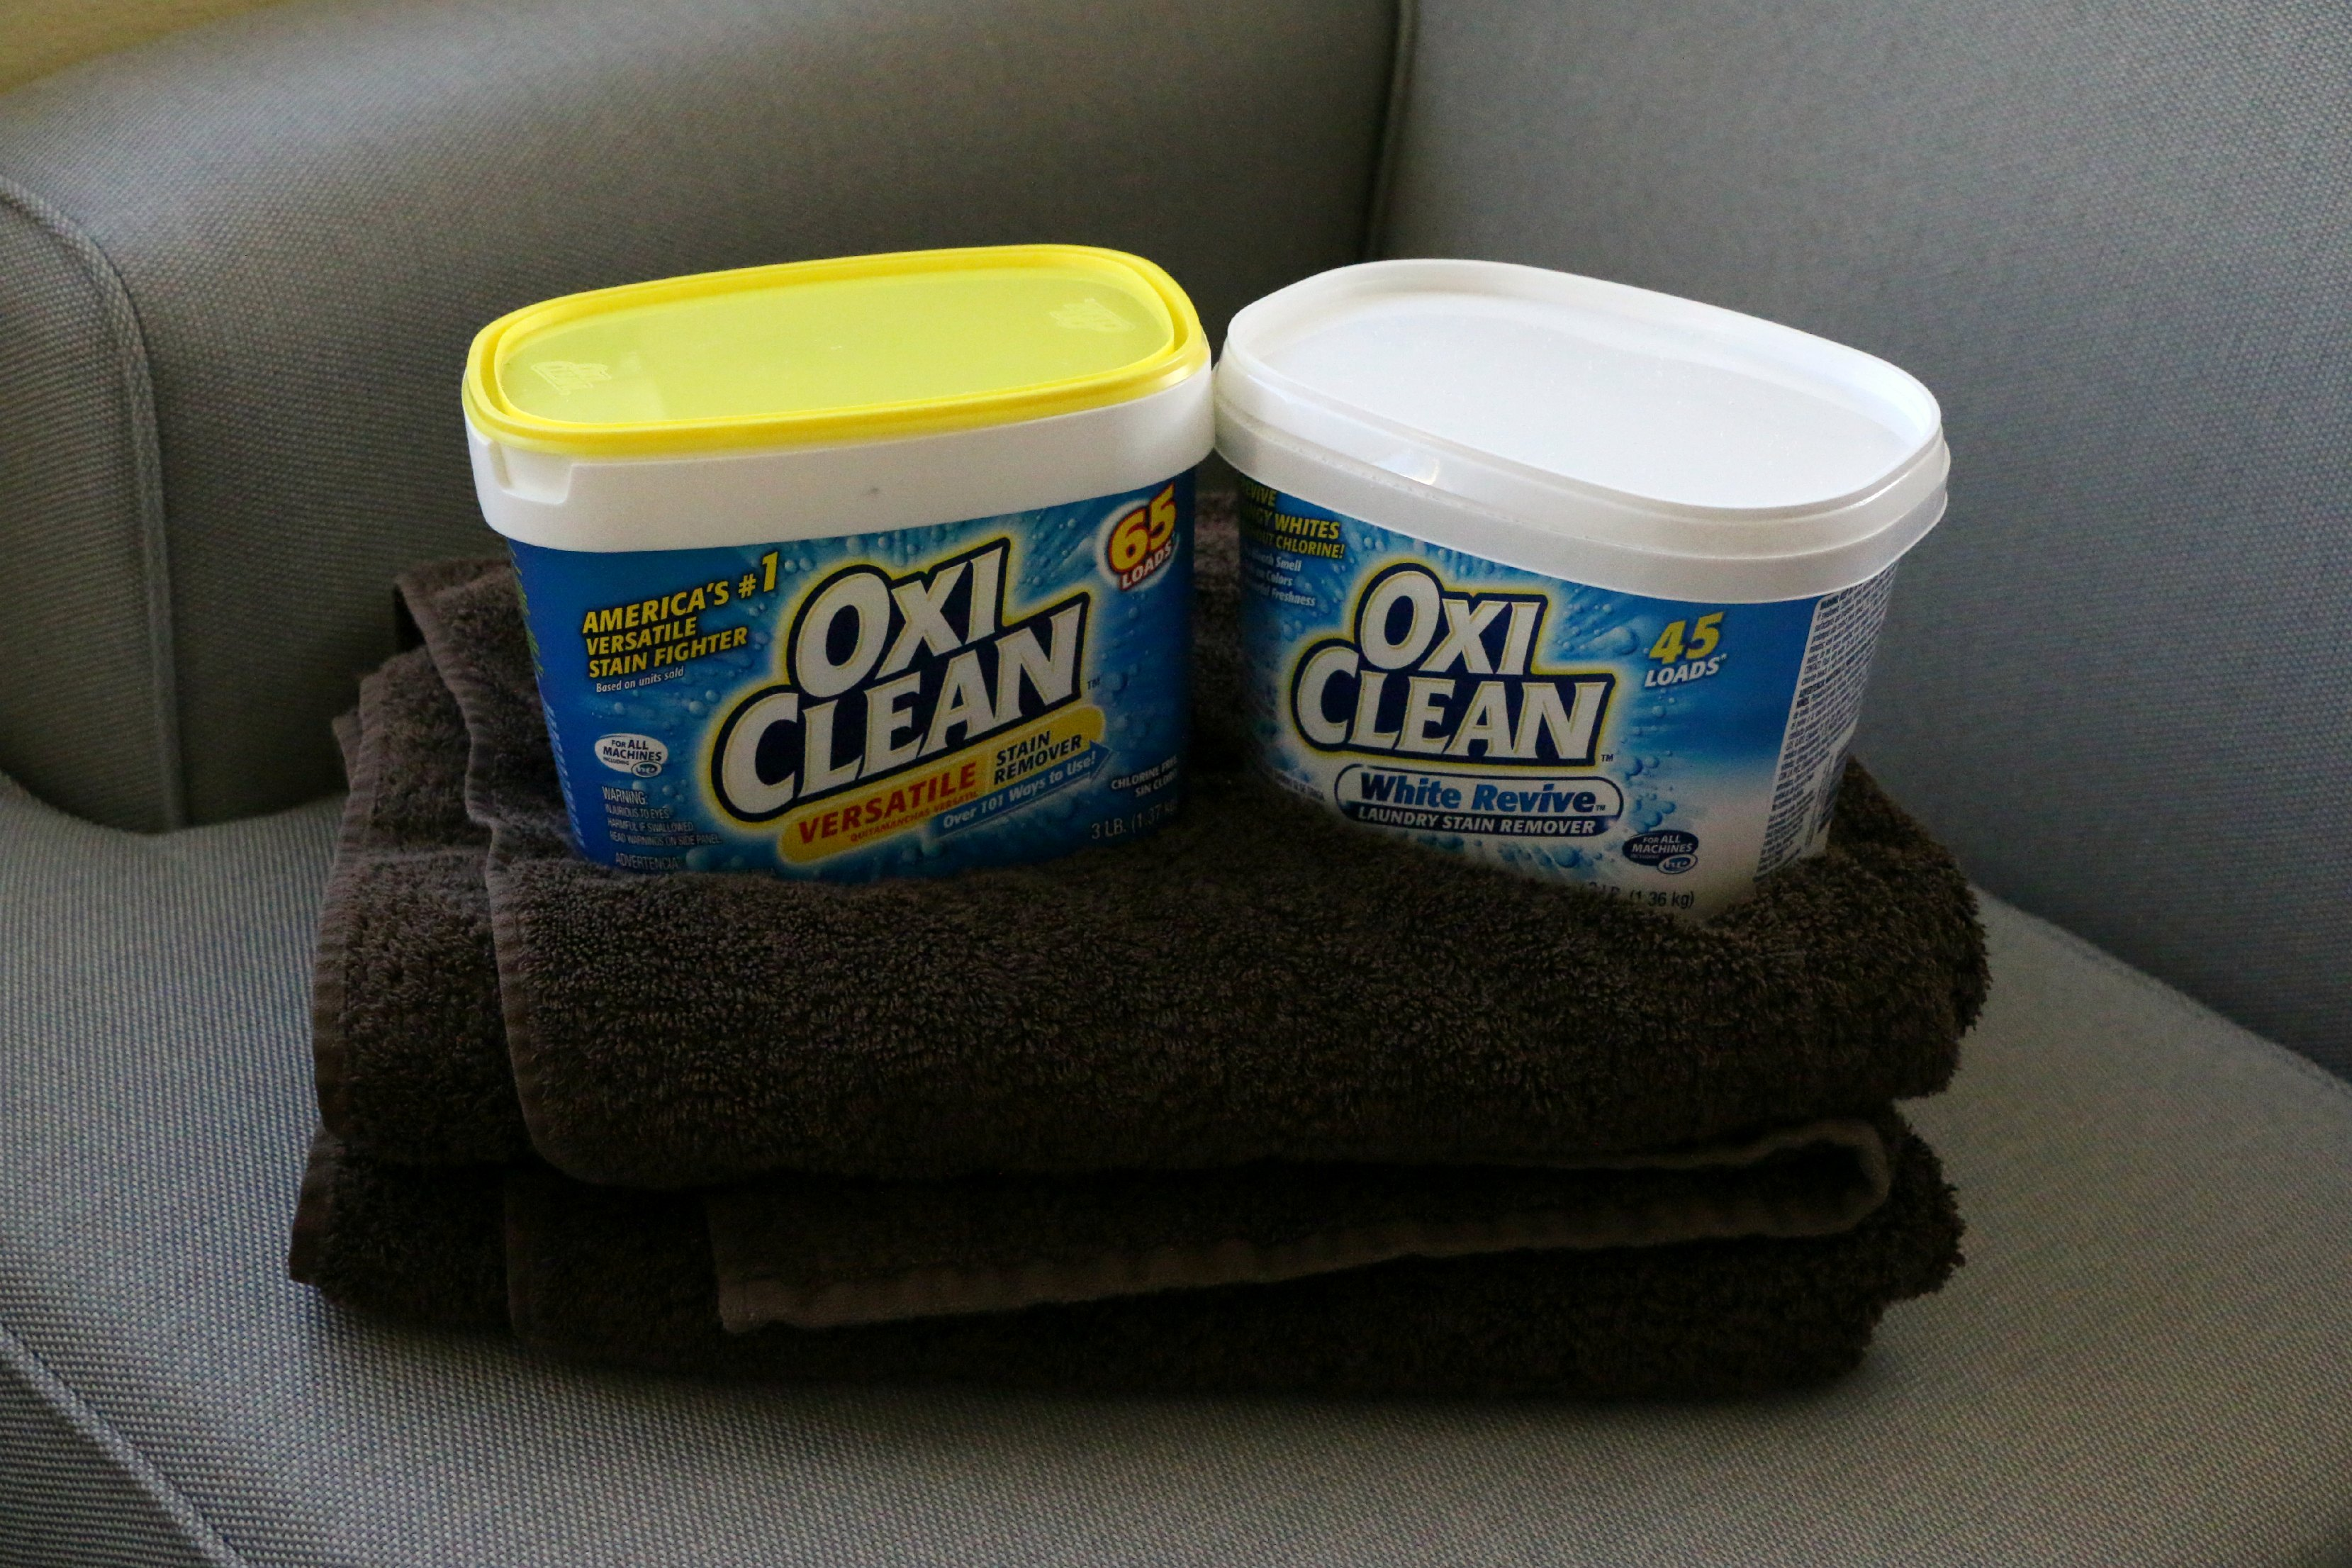 oxi clean white revive